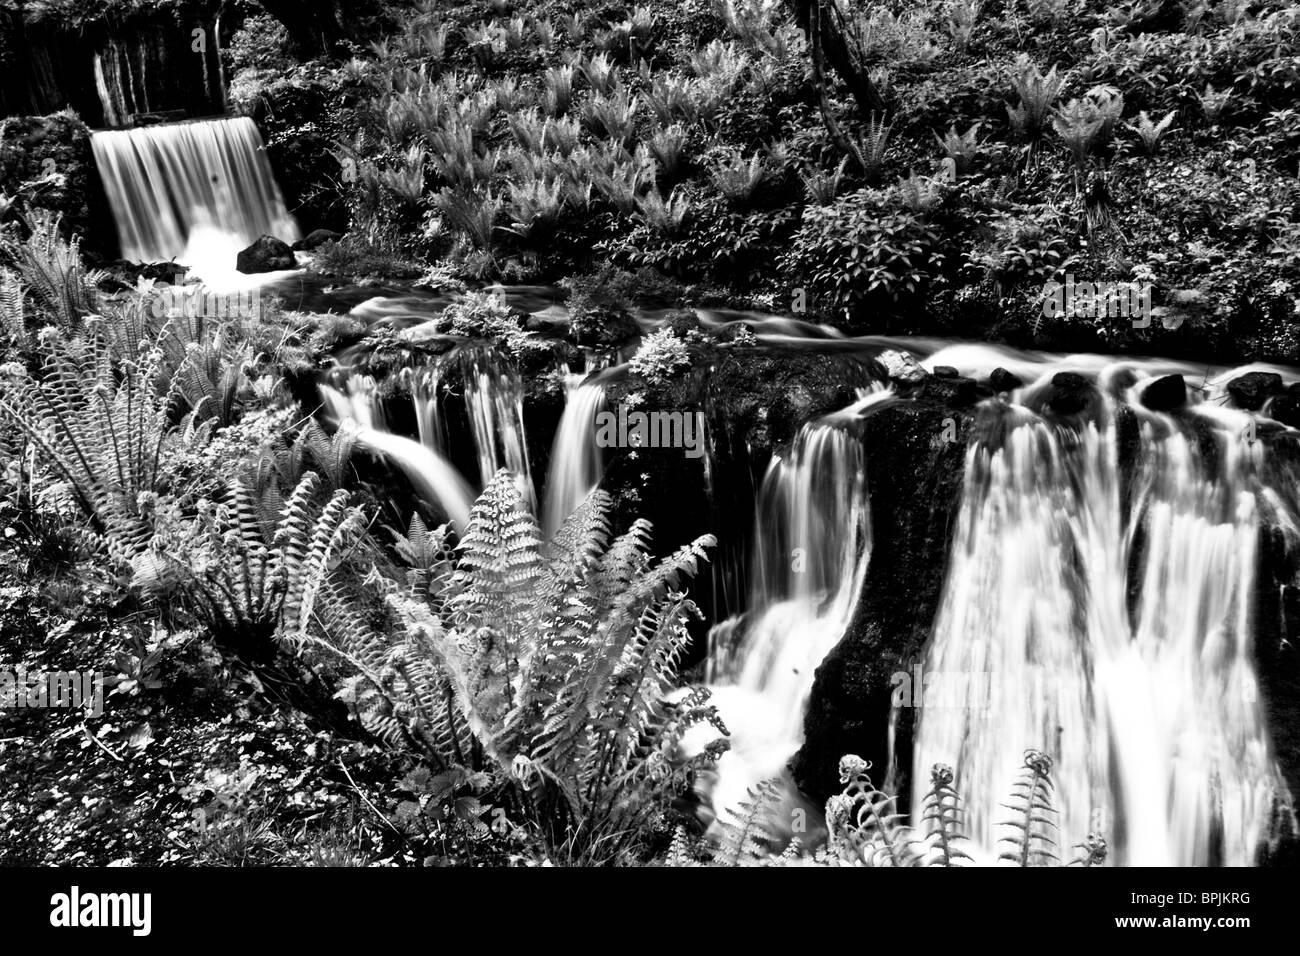 Waterfall pathways - Stock Image